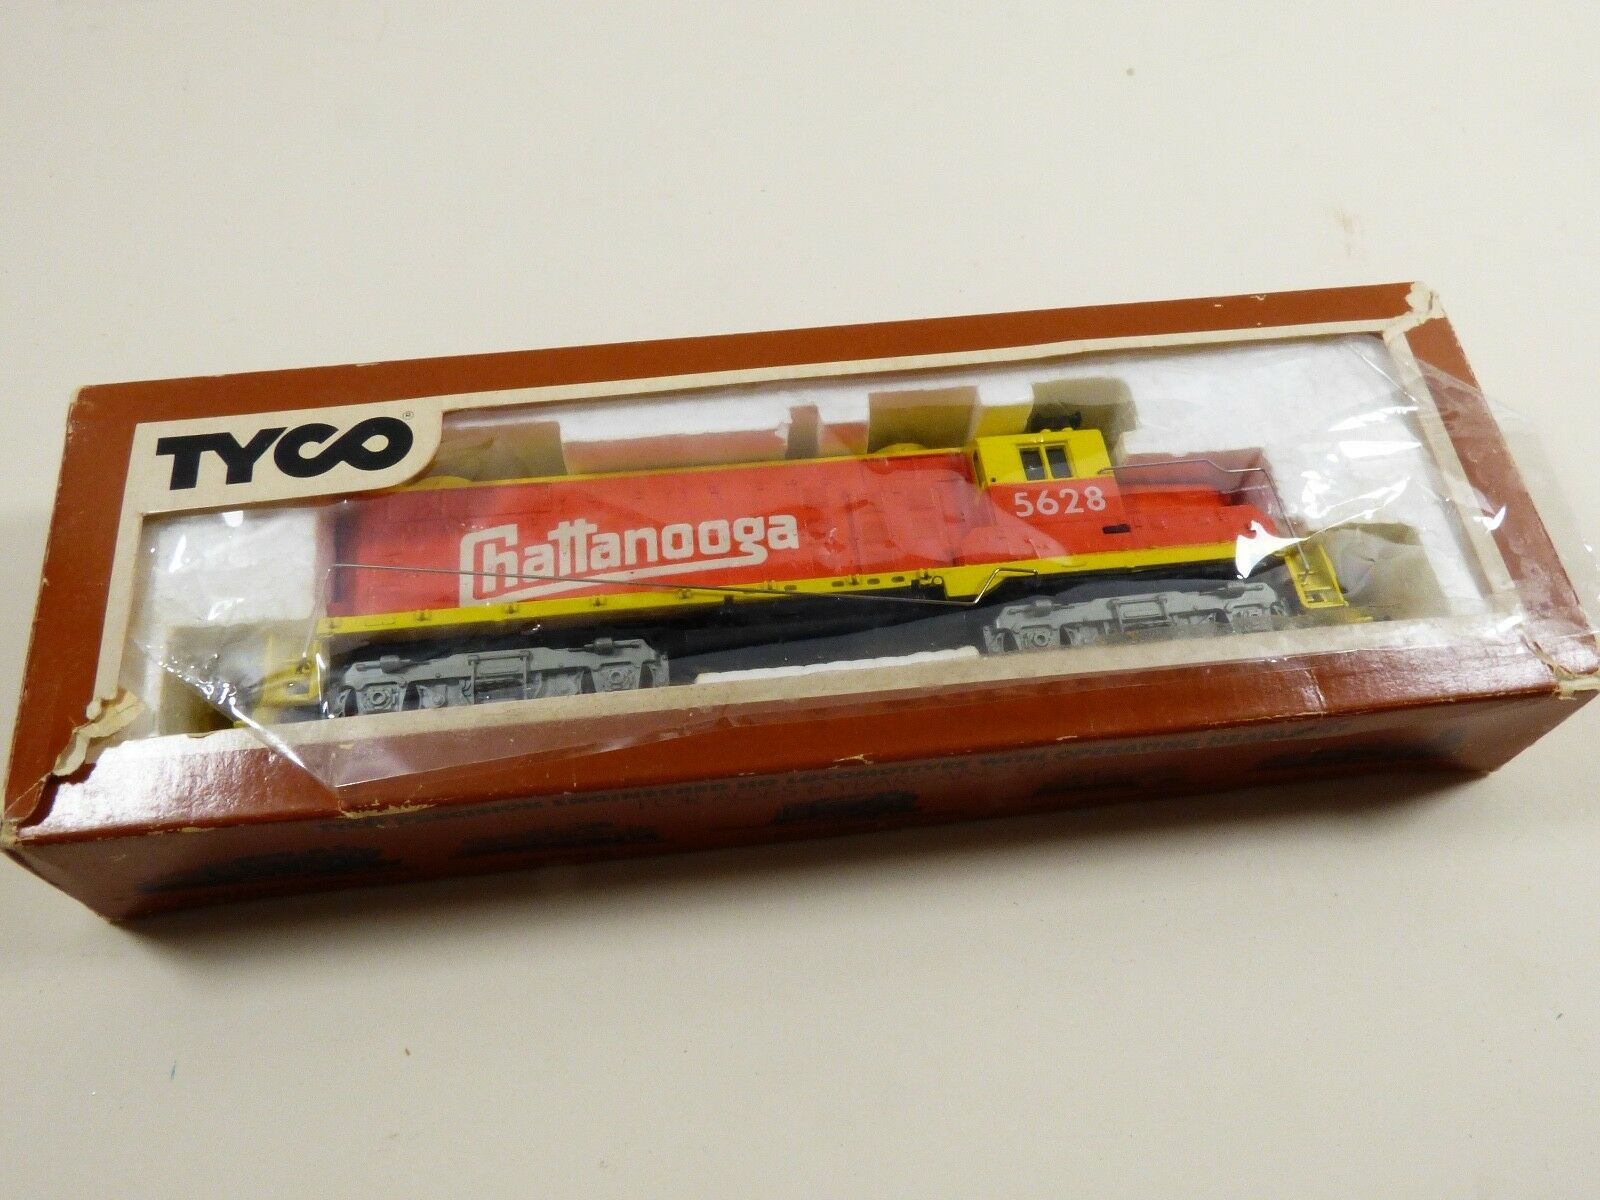 VTG Tyco Chattanooga 5628 Diesel Locomotive HO Scale Train Engine Railroad